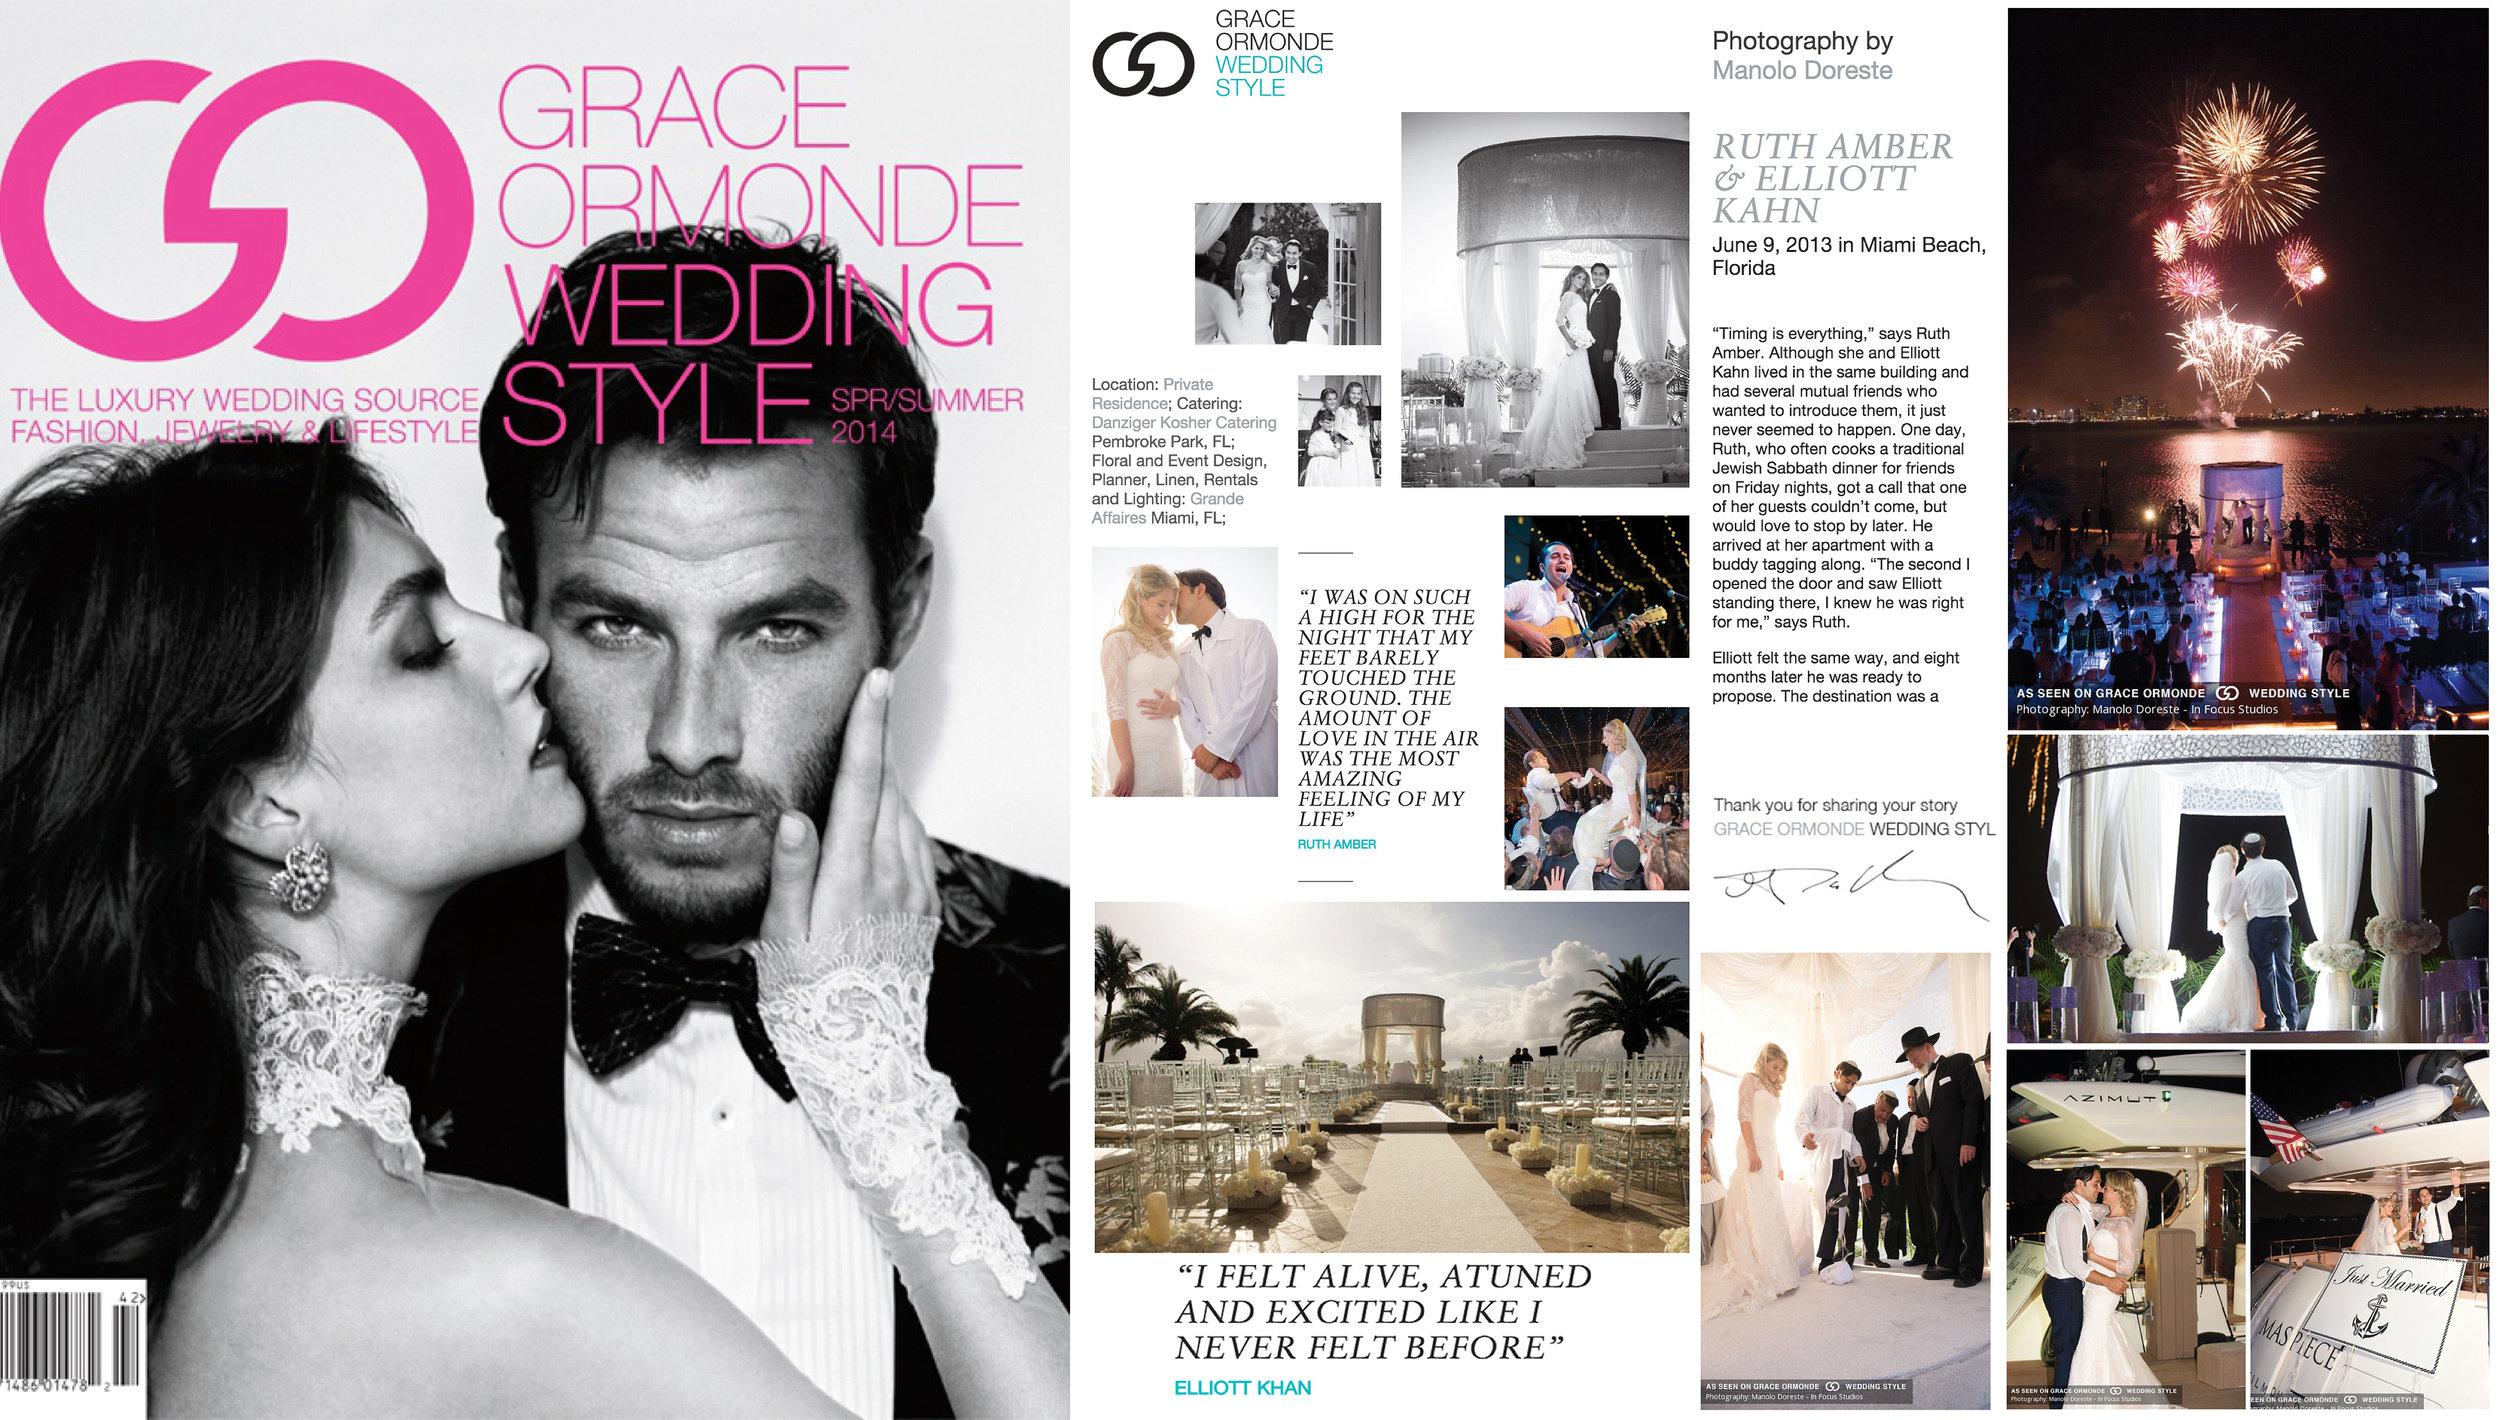 Grace Ormonde | Wedding Style